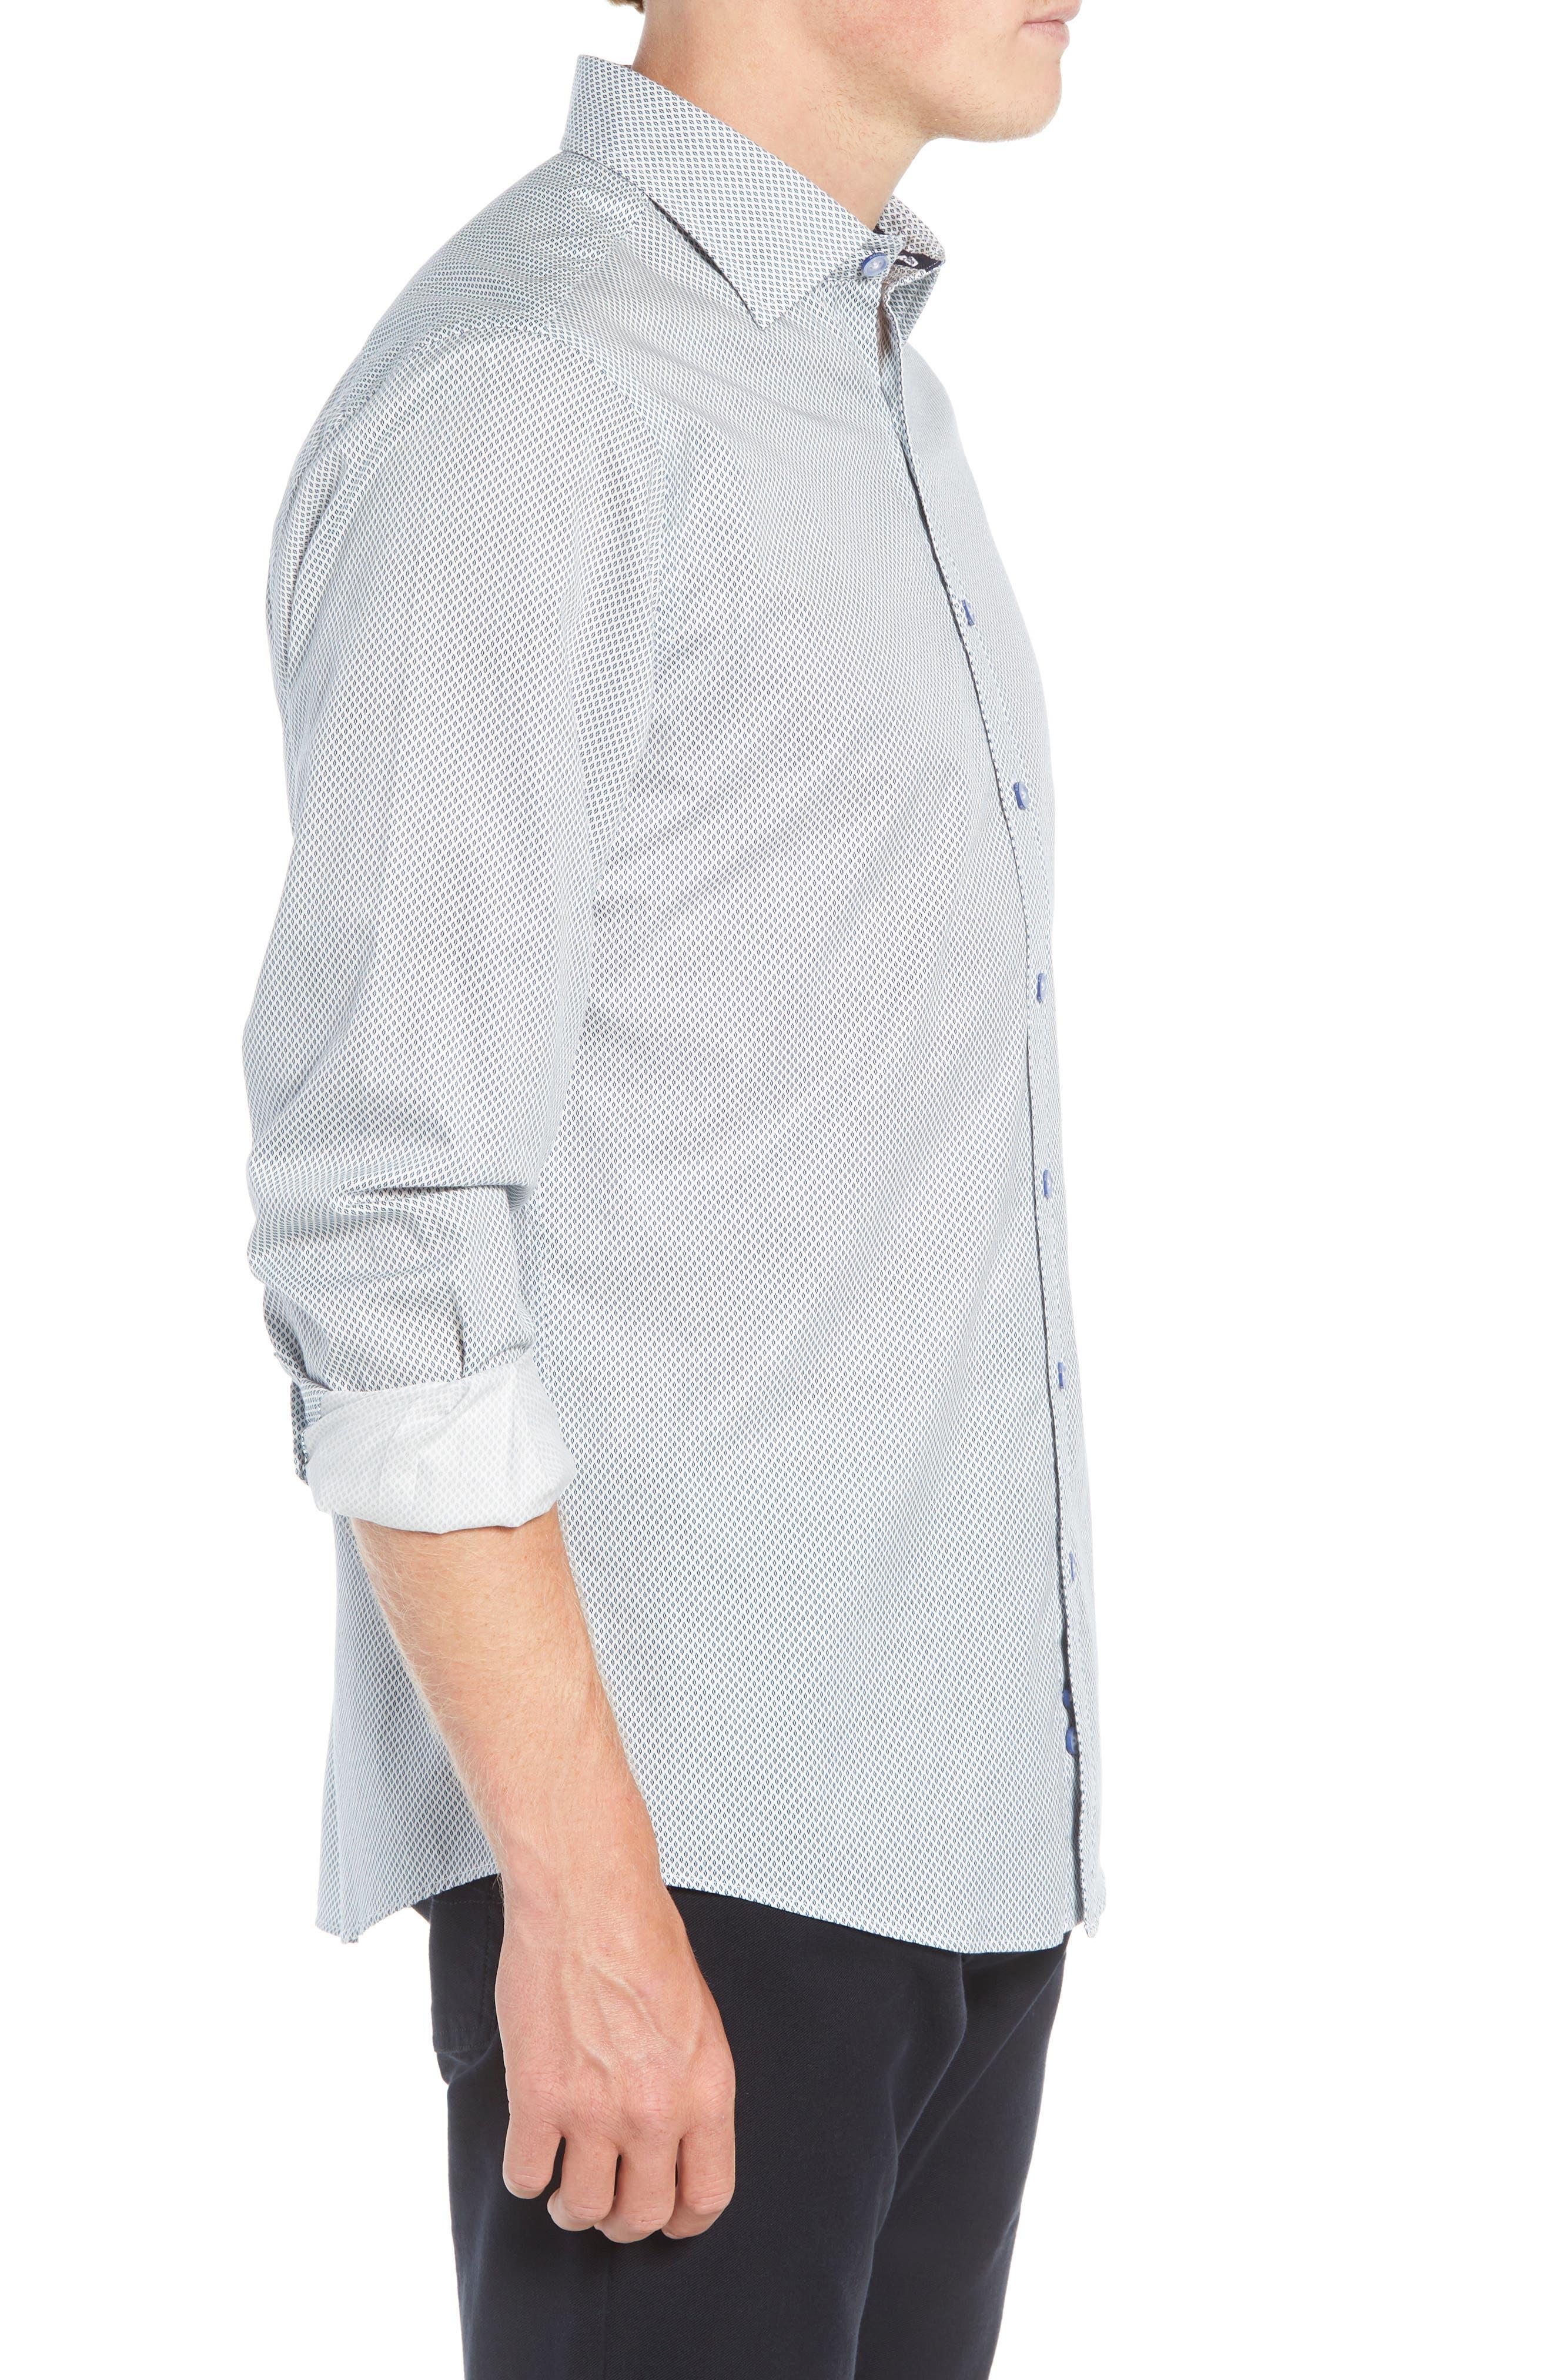 RODD & GUNN, Helston Way Regular Fit Sport Shirt, Alternate thumbnail 4, color, SNOW